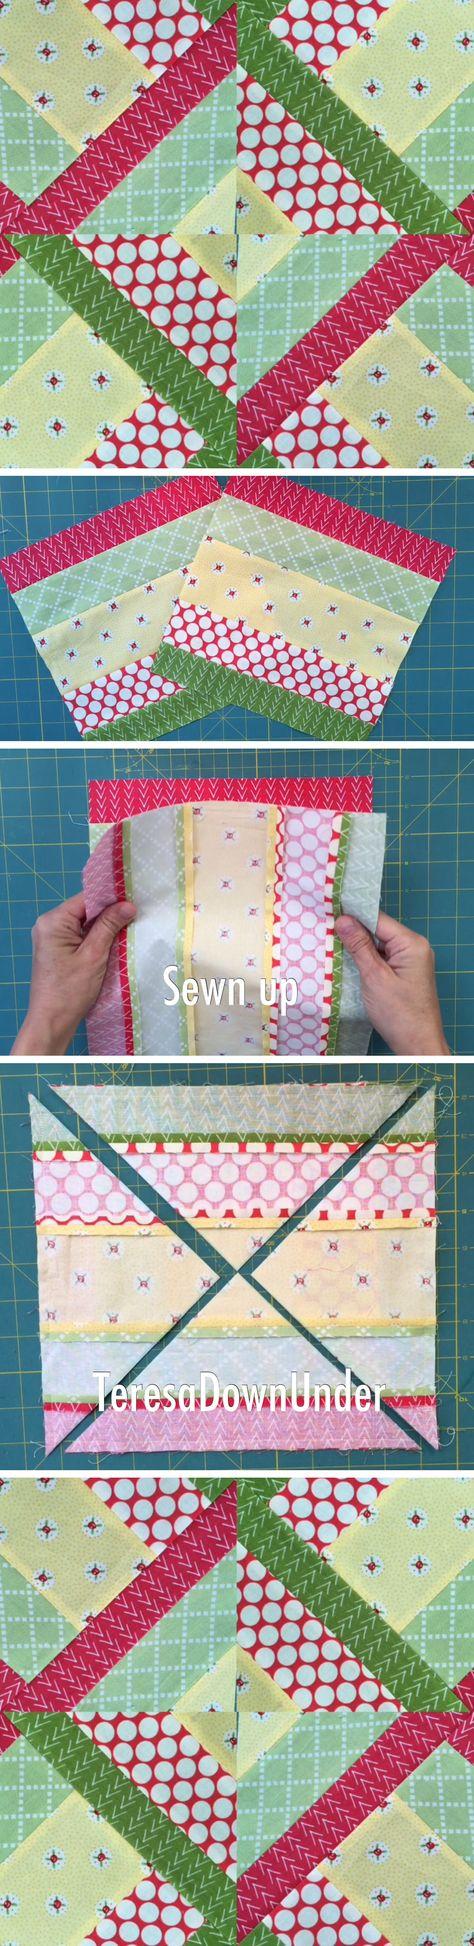 From 5 fabric strips to quilt block video tutorial (Hidden wells)